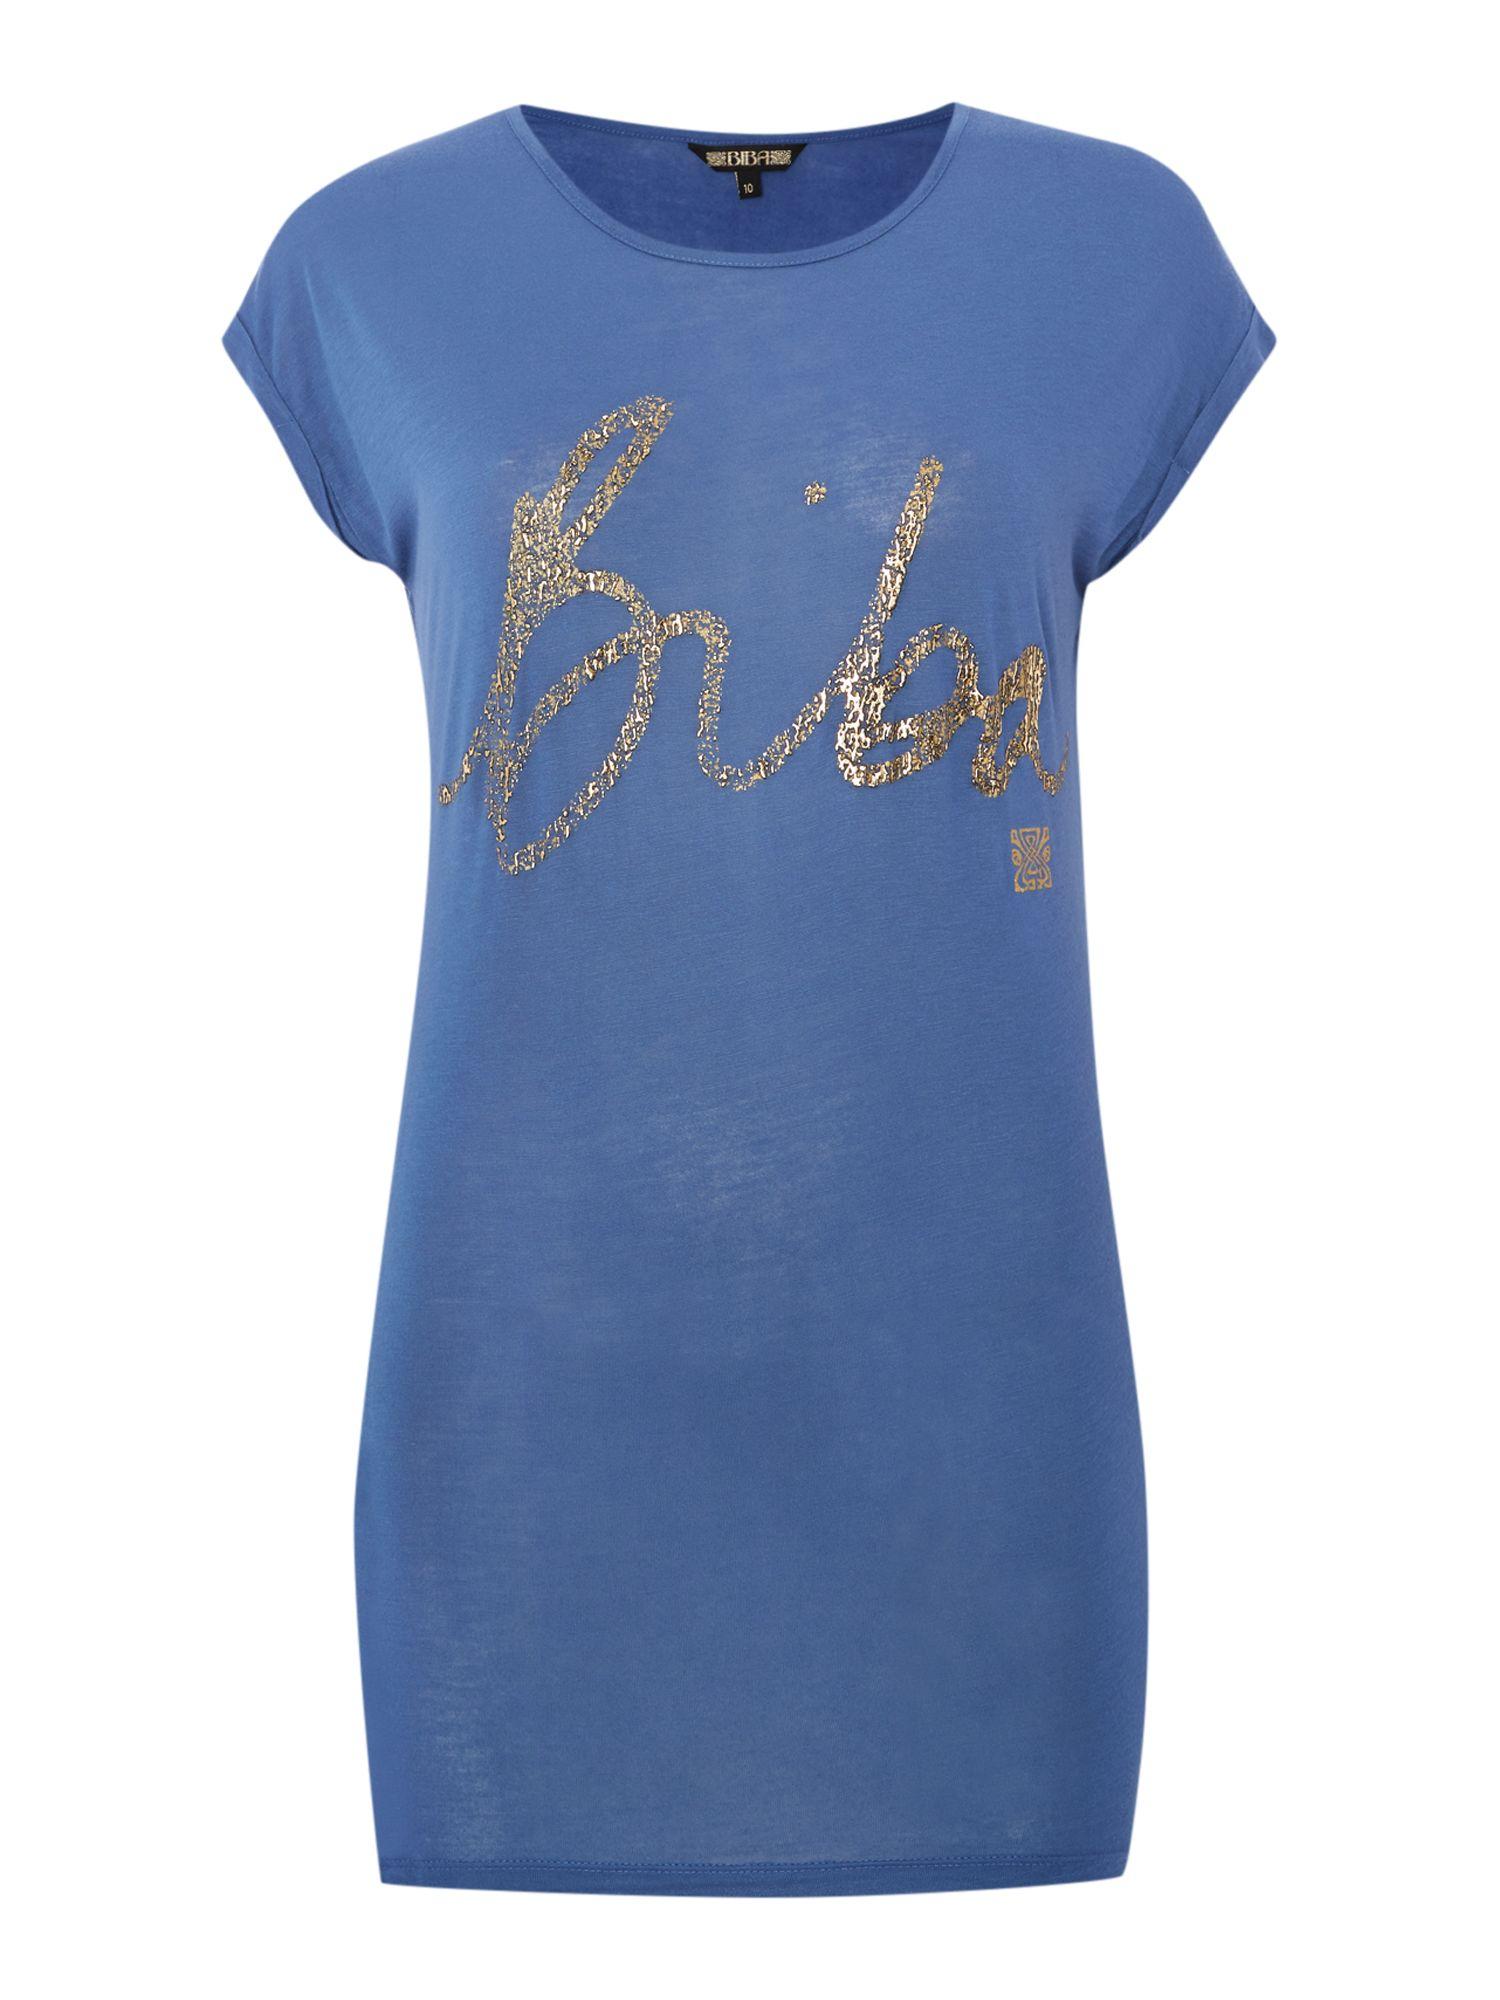 Biba foil print t shirt in blue lyst for Foil print t shirts custom